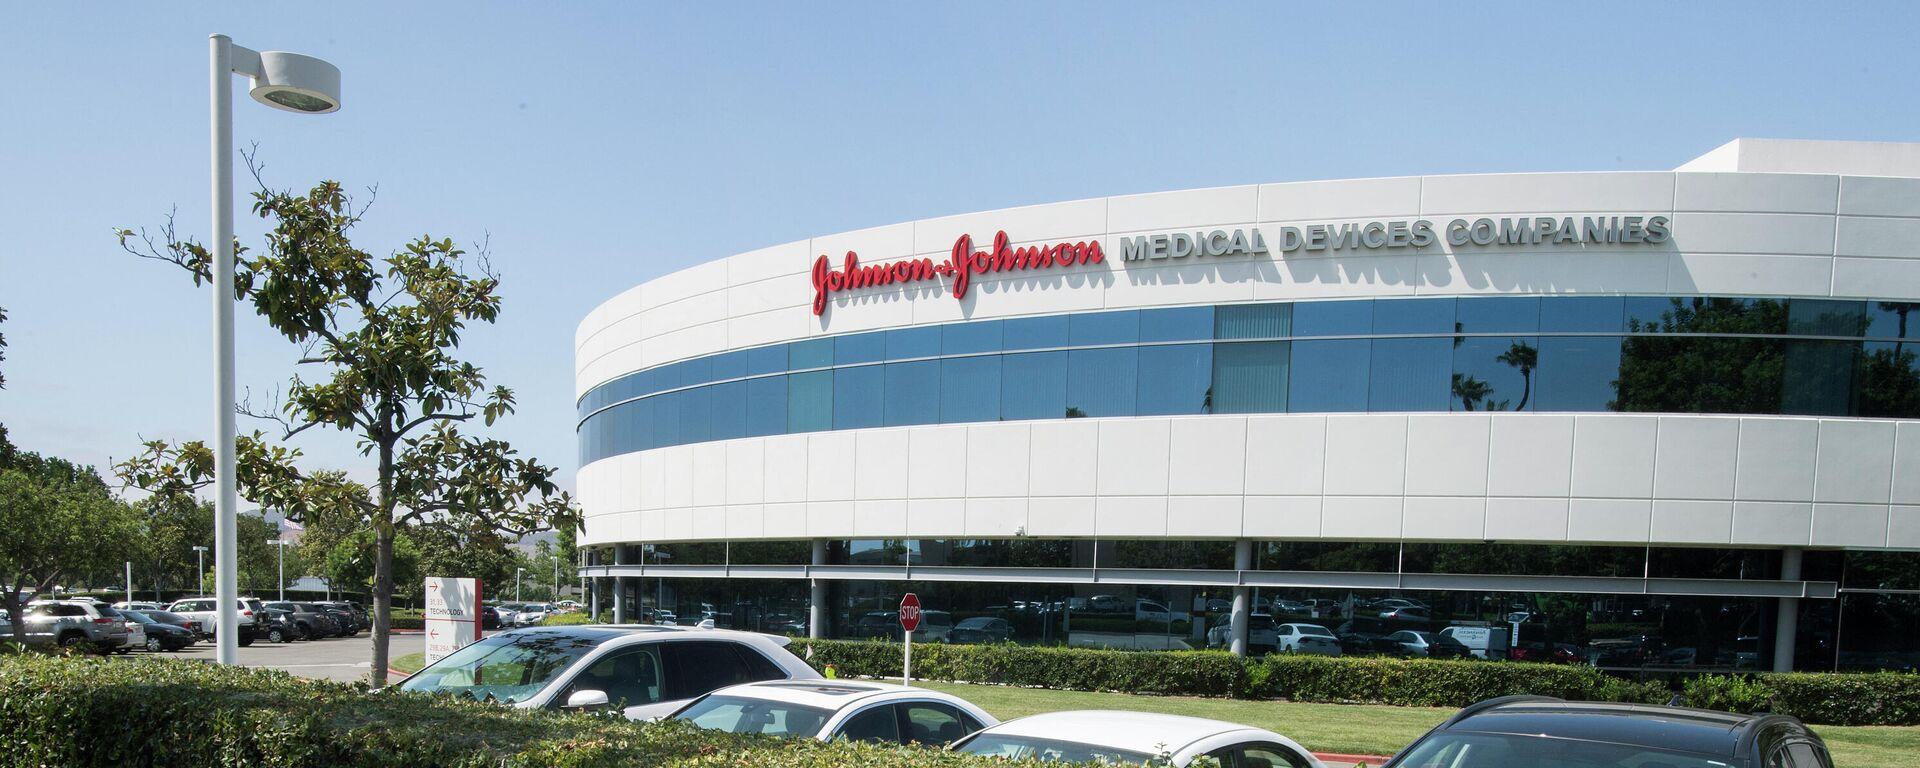 Die Johnson & Johnson-Zentrale in Irvine, California - SNA, 1920, 27.06.2021